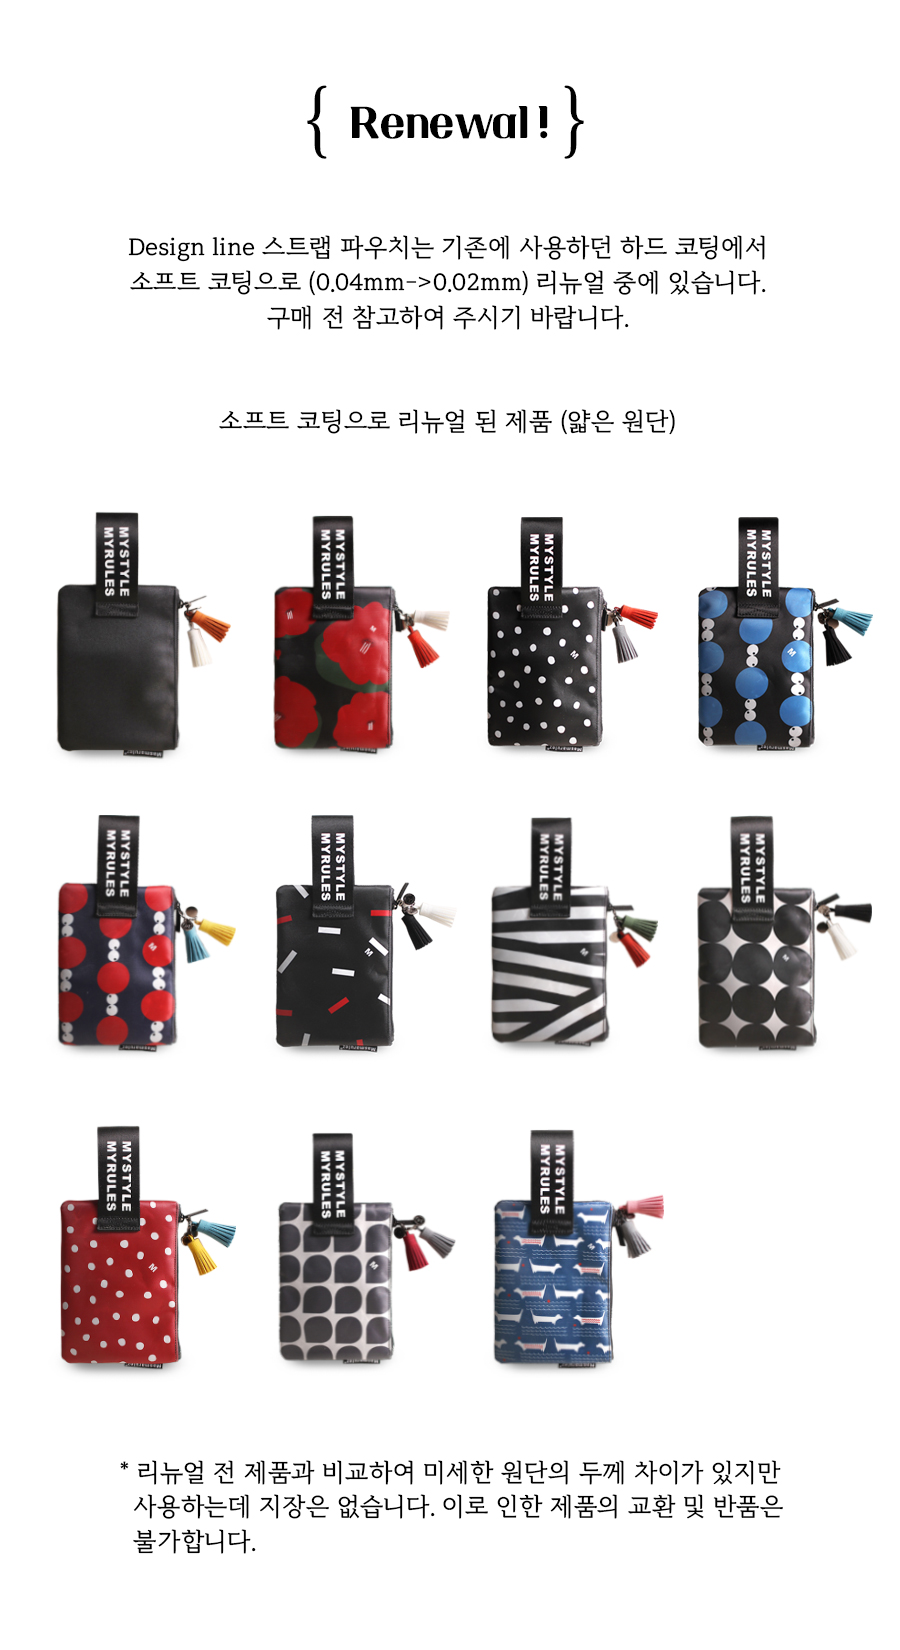 White red retangle 마약 스트랩 파우치 - 마스마룰즈, 13,520원, 다용도파우치, 지퍼형